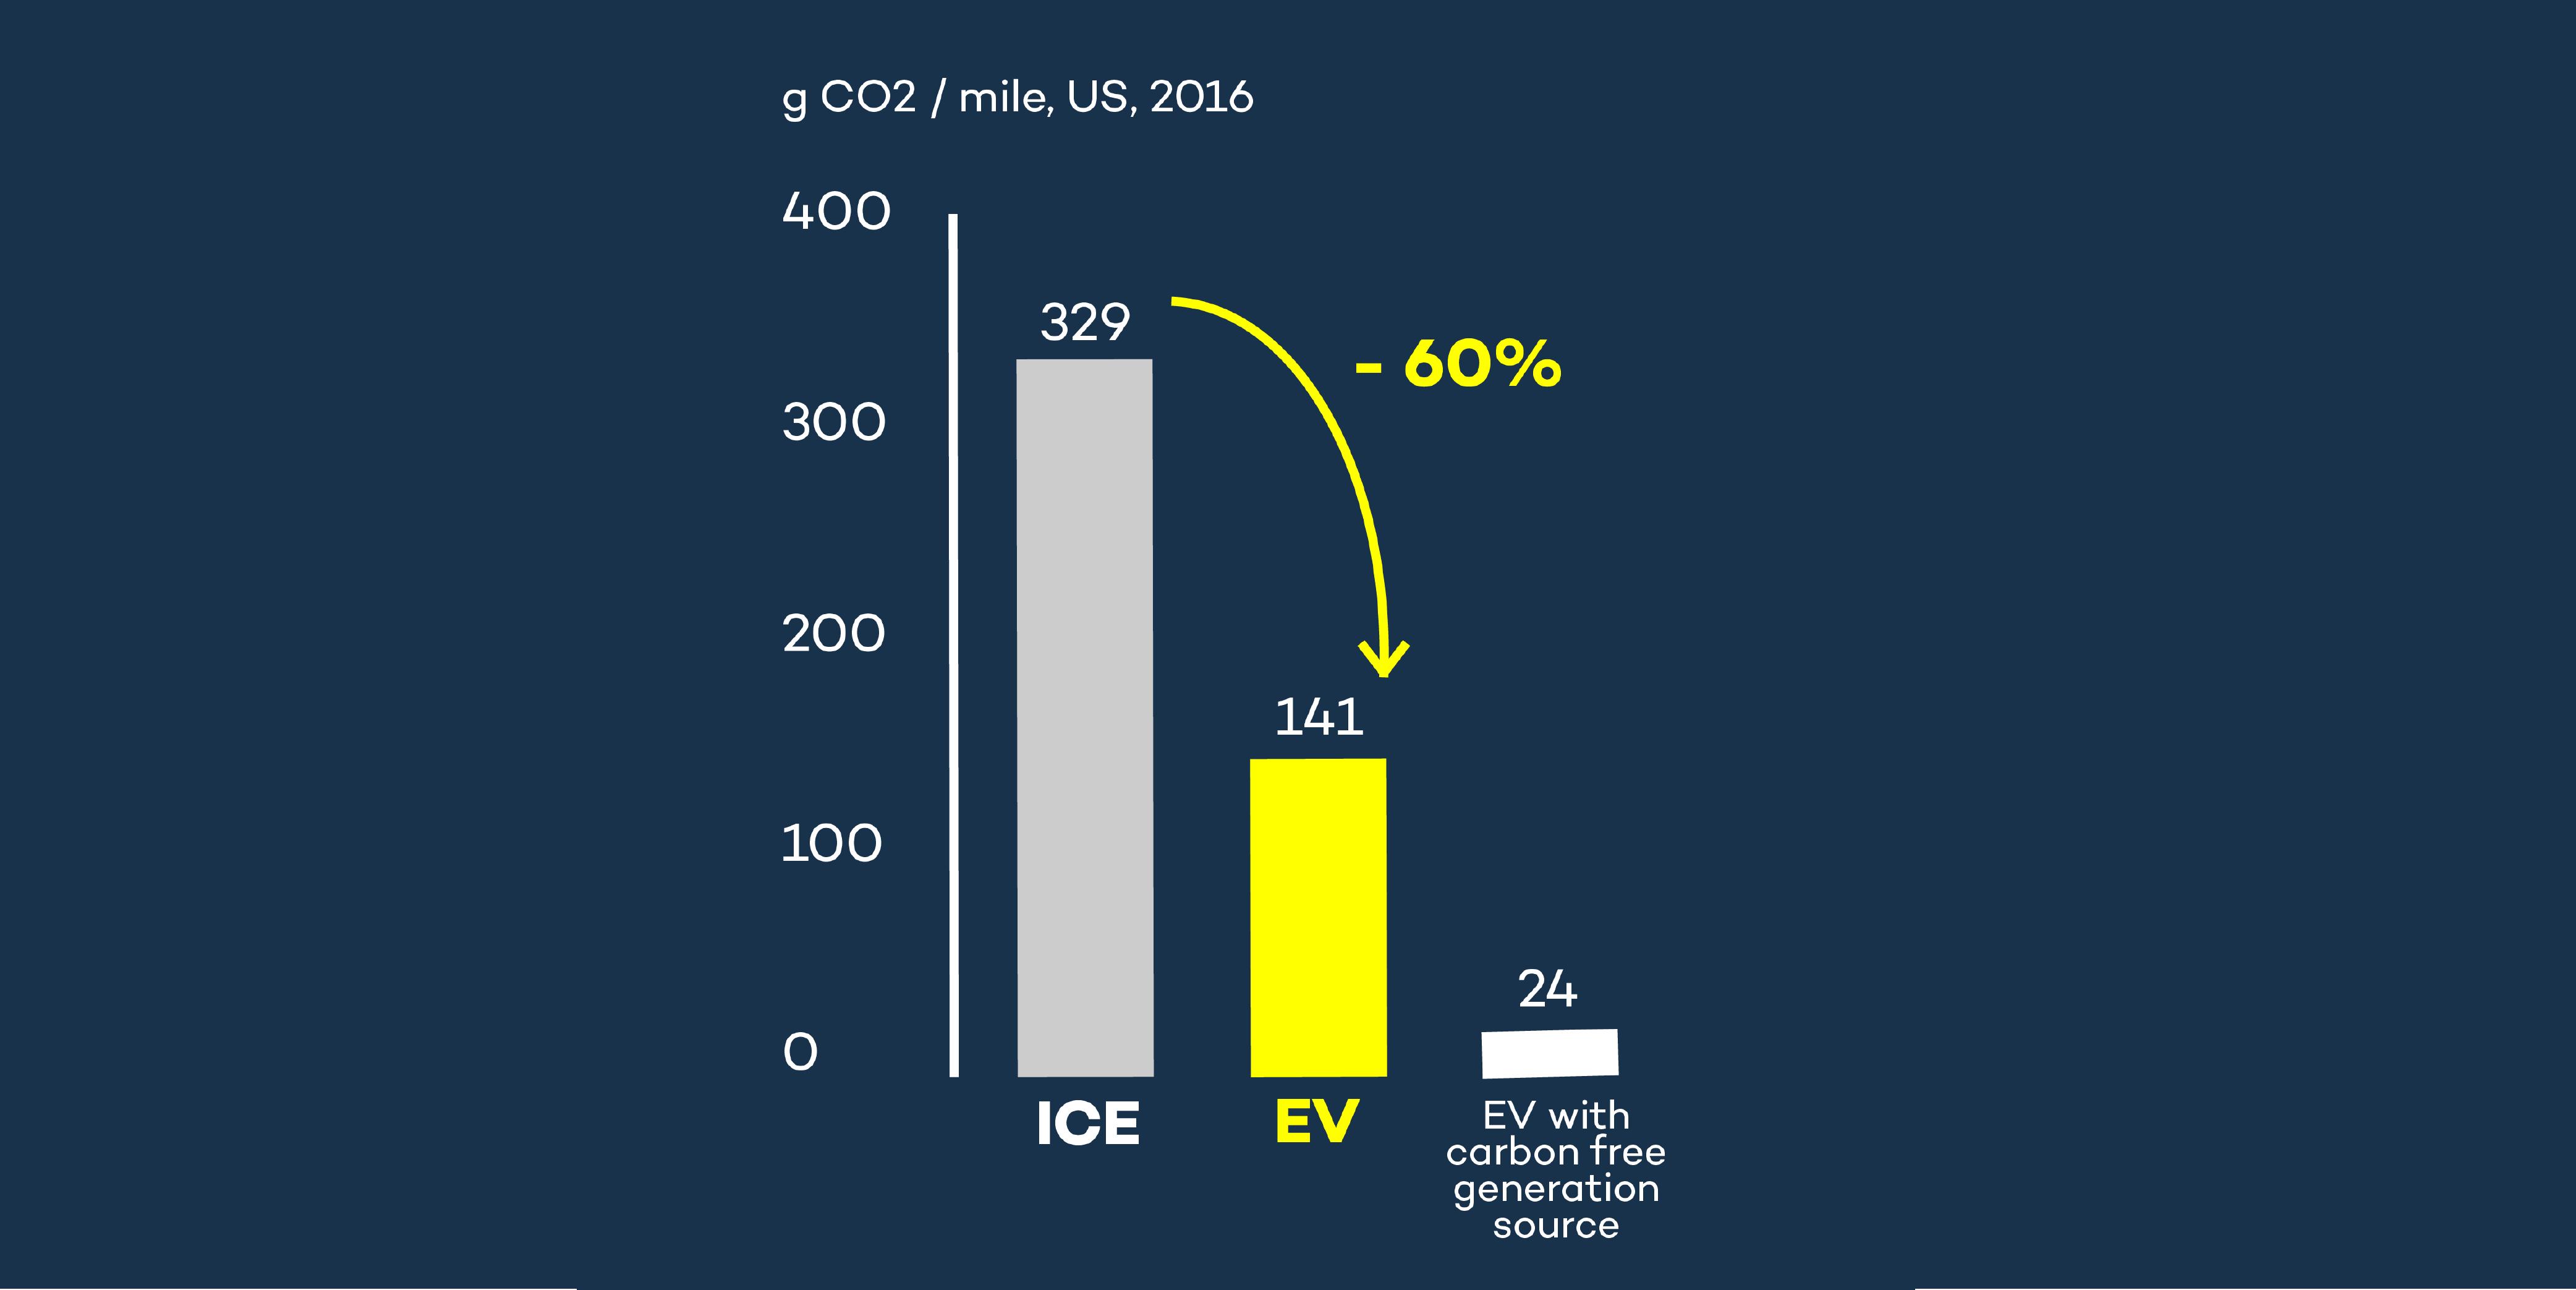 Busting EV myths: Electric transportation reduces emissions significantly